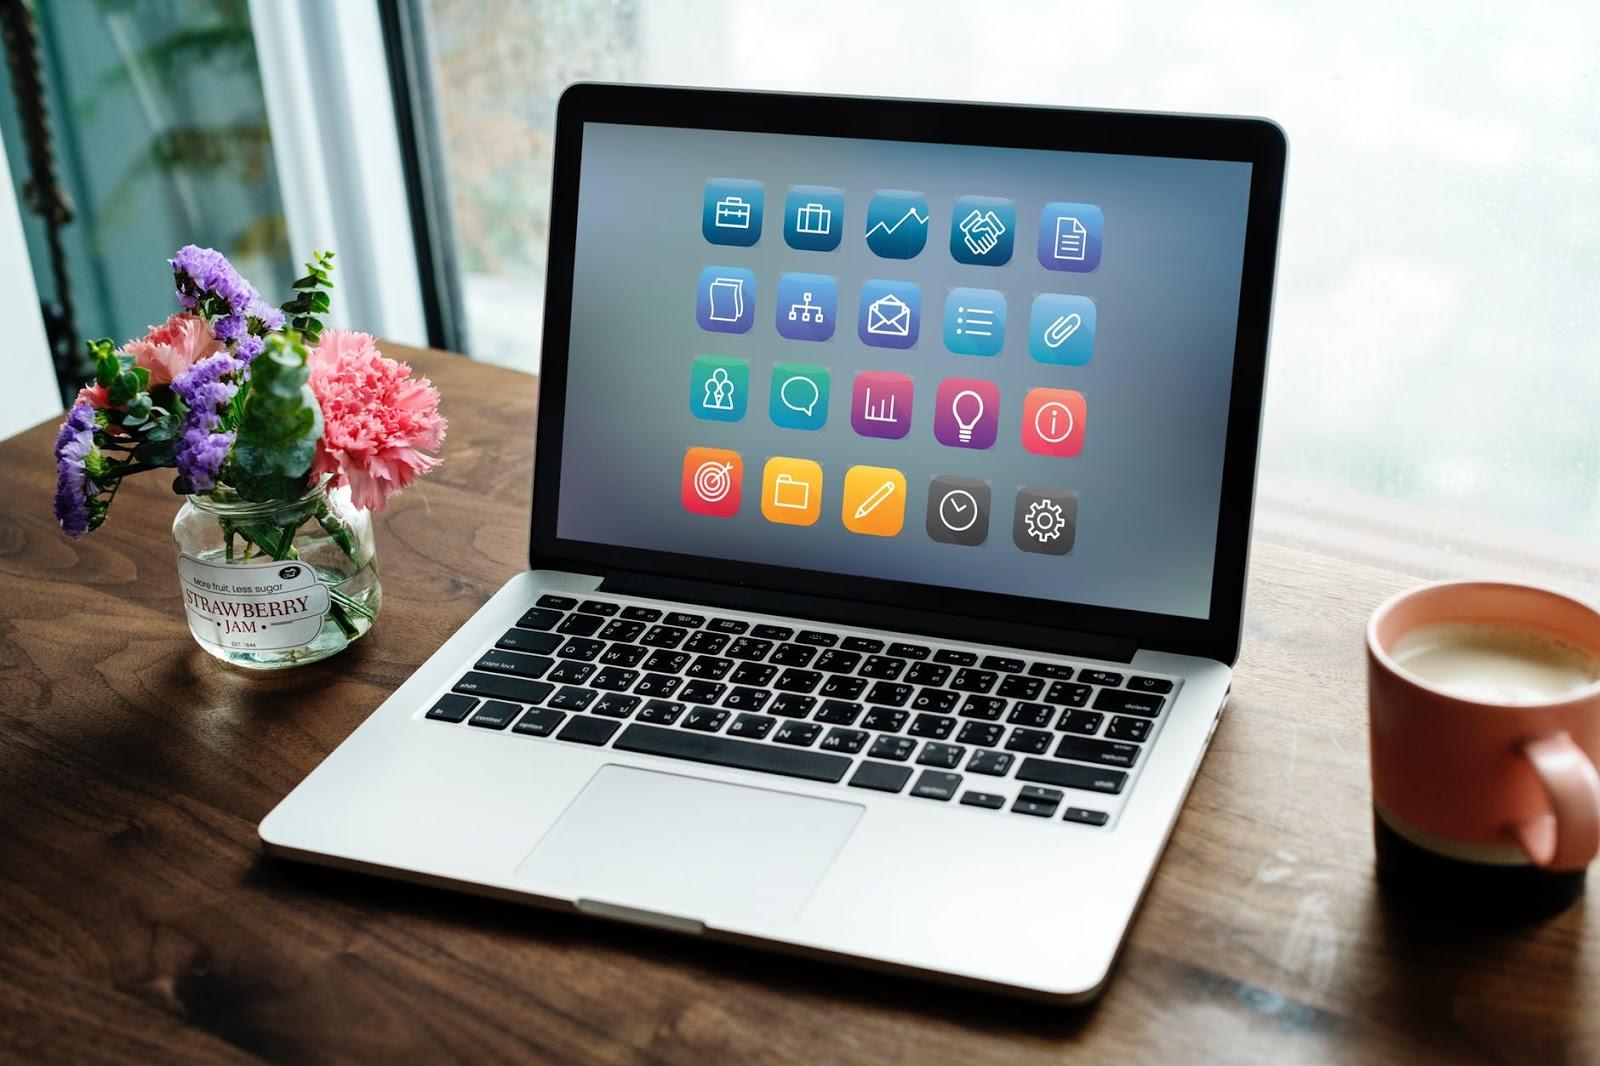 Cara Instal Aplikasi di Laptop (Panduan Lengkap Untuk ...